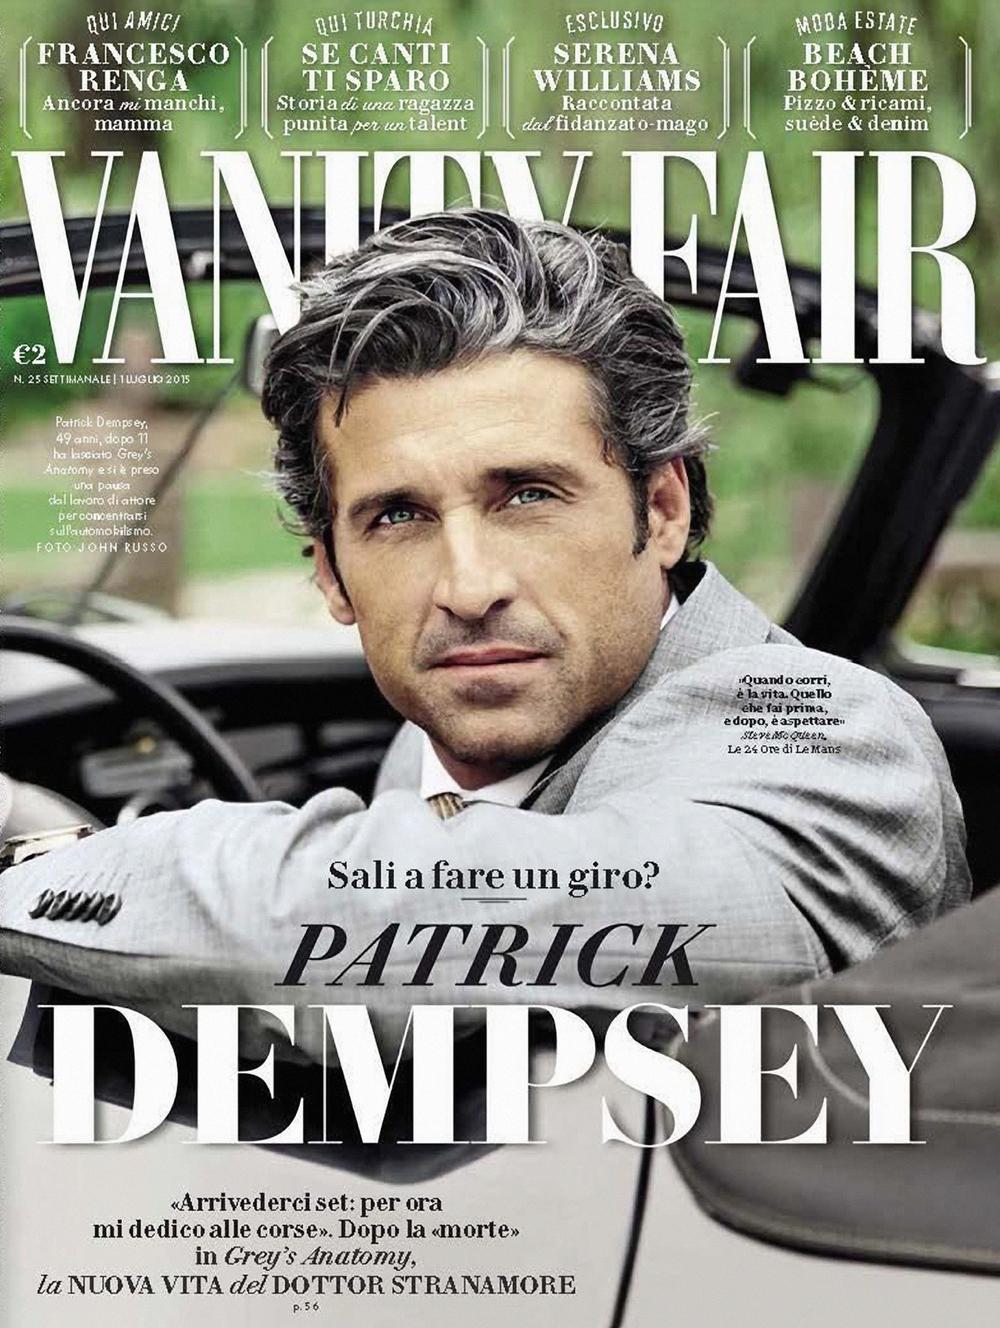 PatrickDempsey_VF_web.jpg